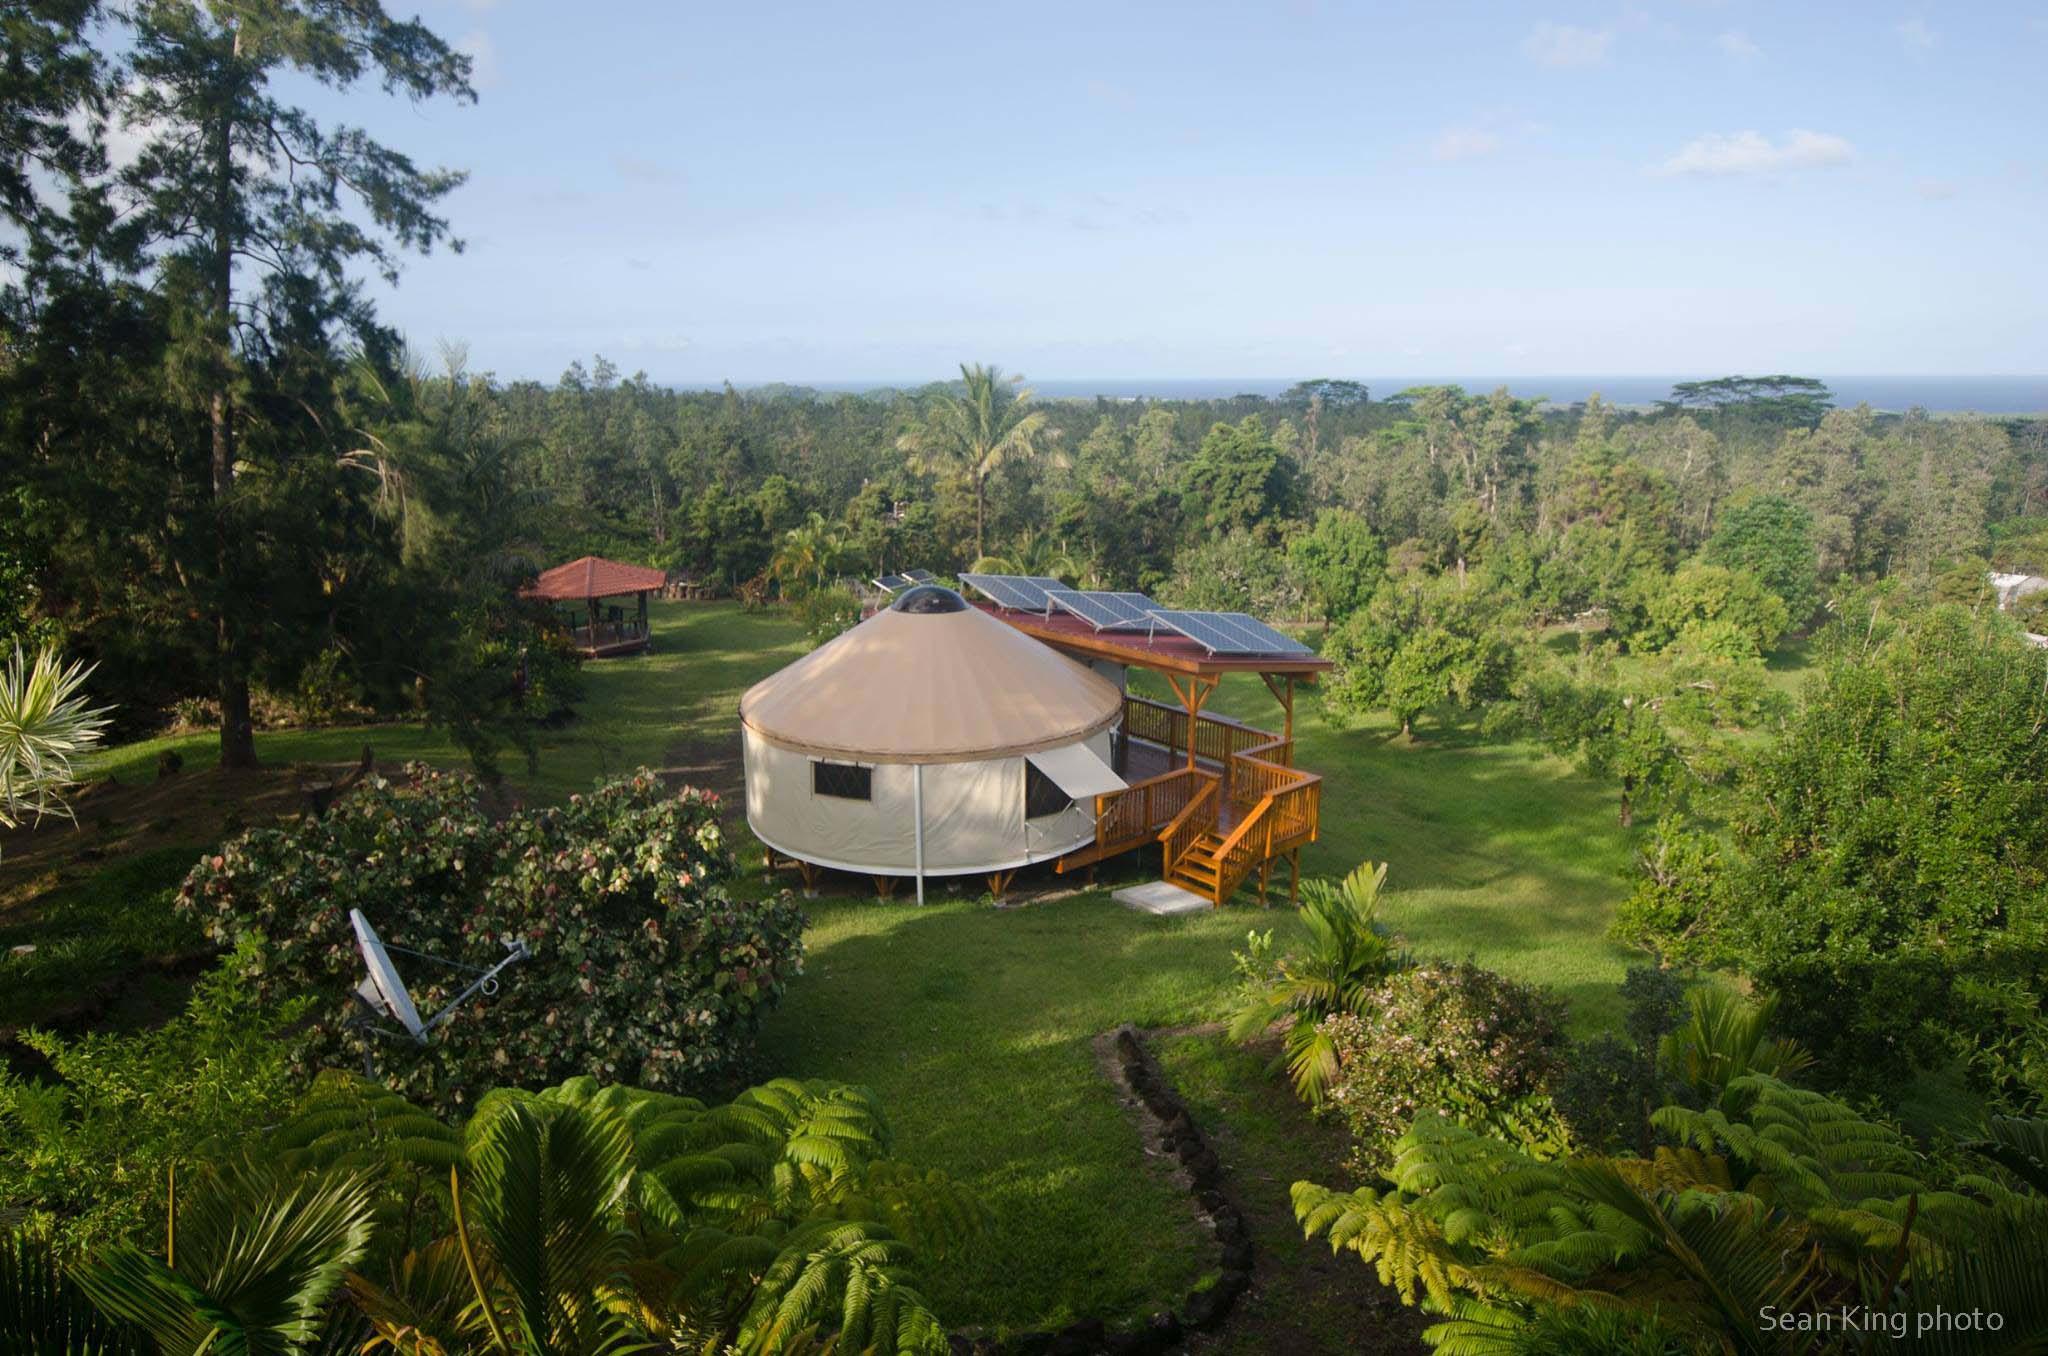 Click image for larger version  Name:Hawaiiyurt-Sean-King[1].jpg Views:311 Size:318.2 KB ID:999